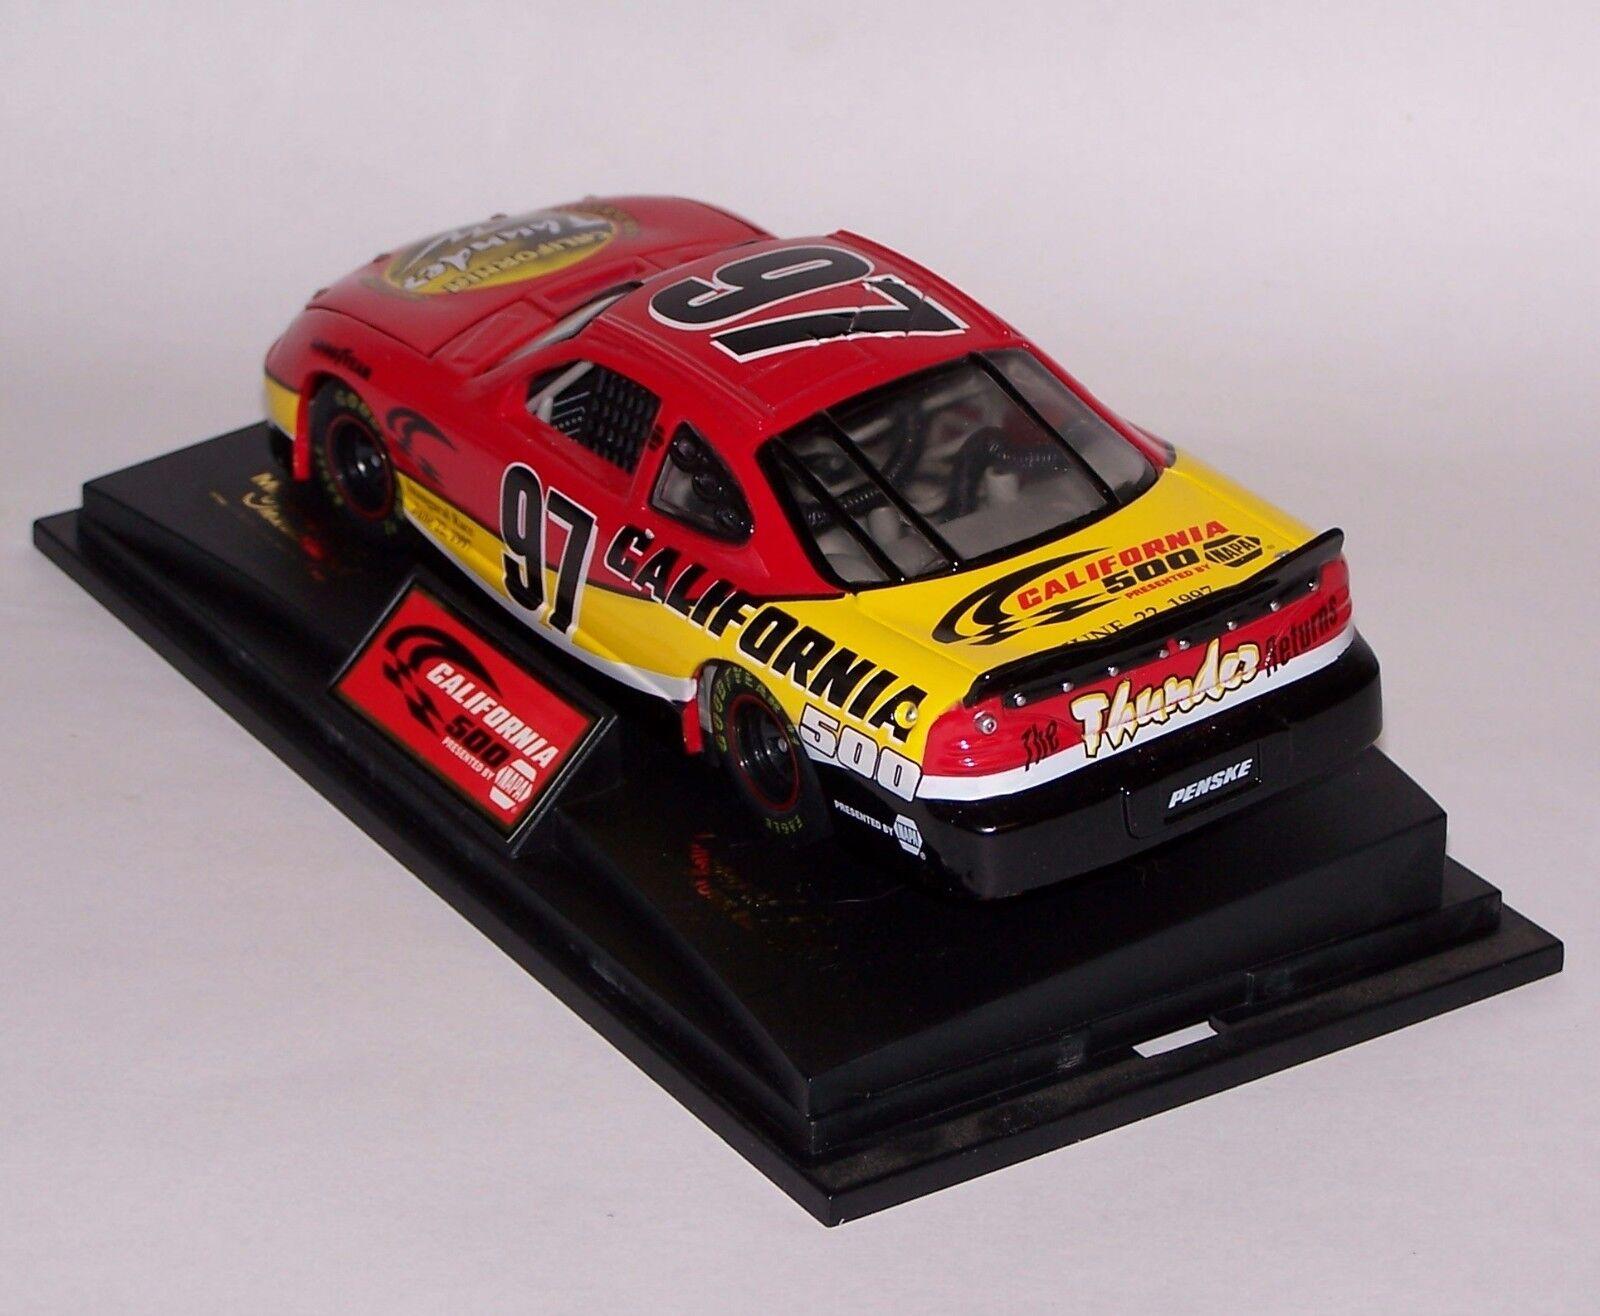 California 500 Inaugural Race 97 Nascar Pace Car 1 24 24 24 Pontiac Grand Prix NIB COA 7b3a27